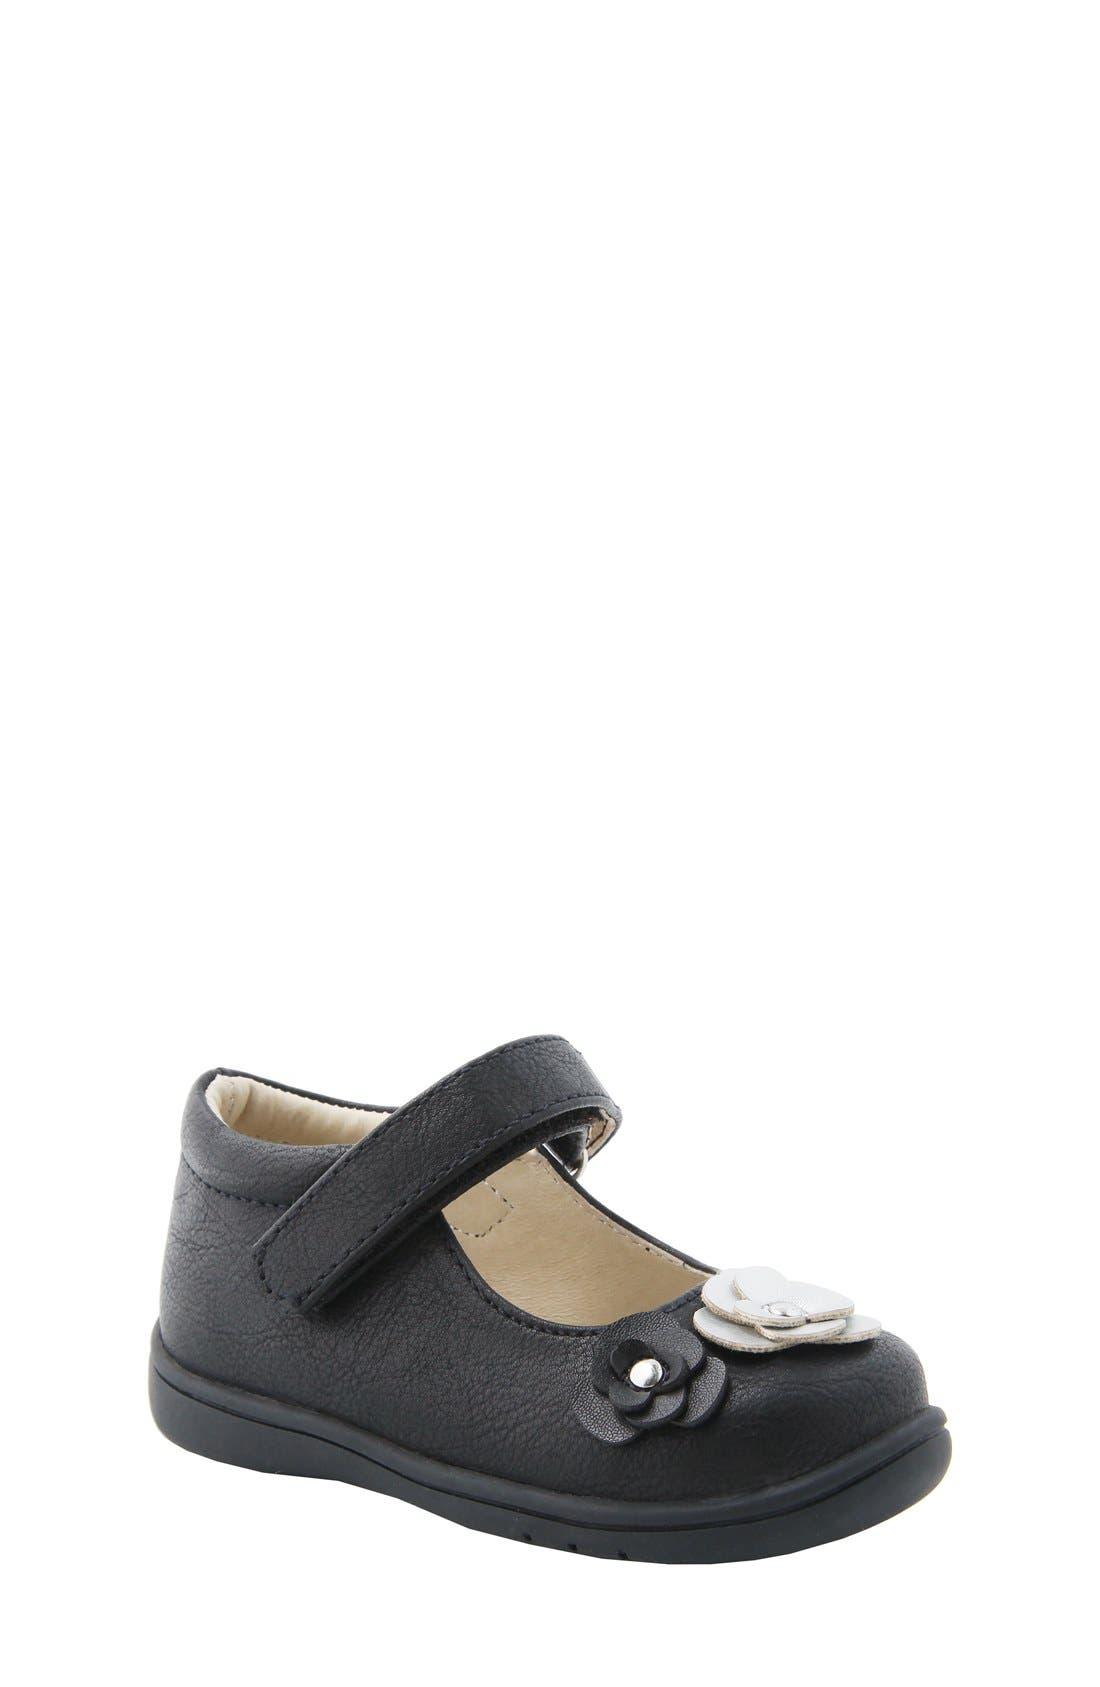 Nina Mary Jane Flat,                         Main,                         color, Black Tumbled